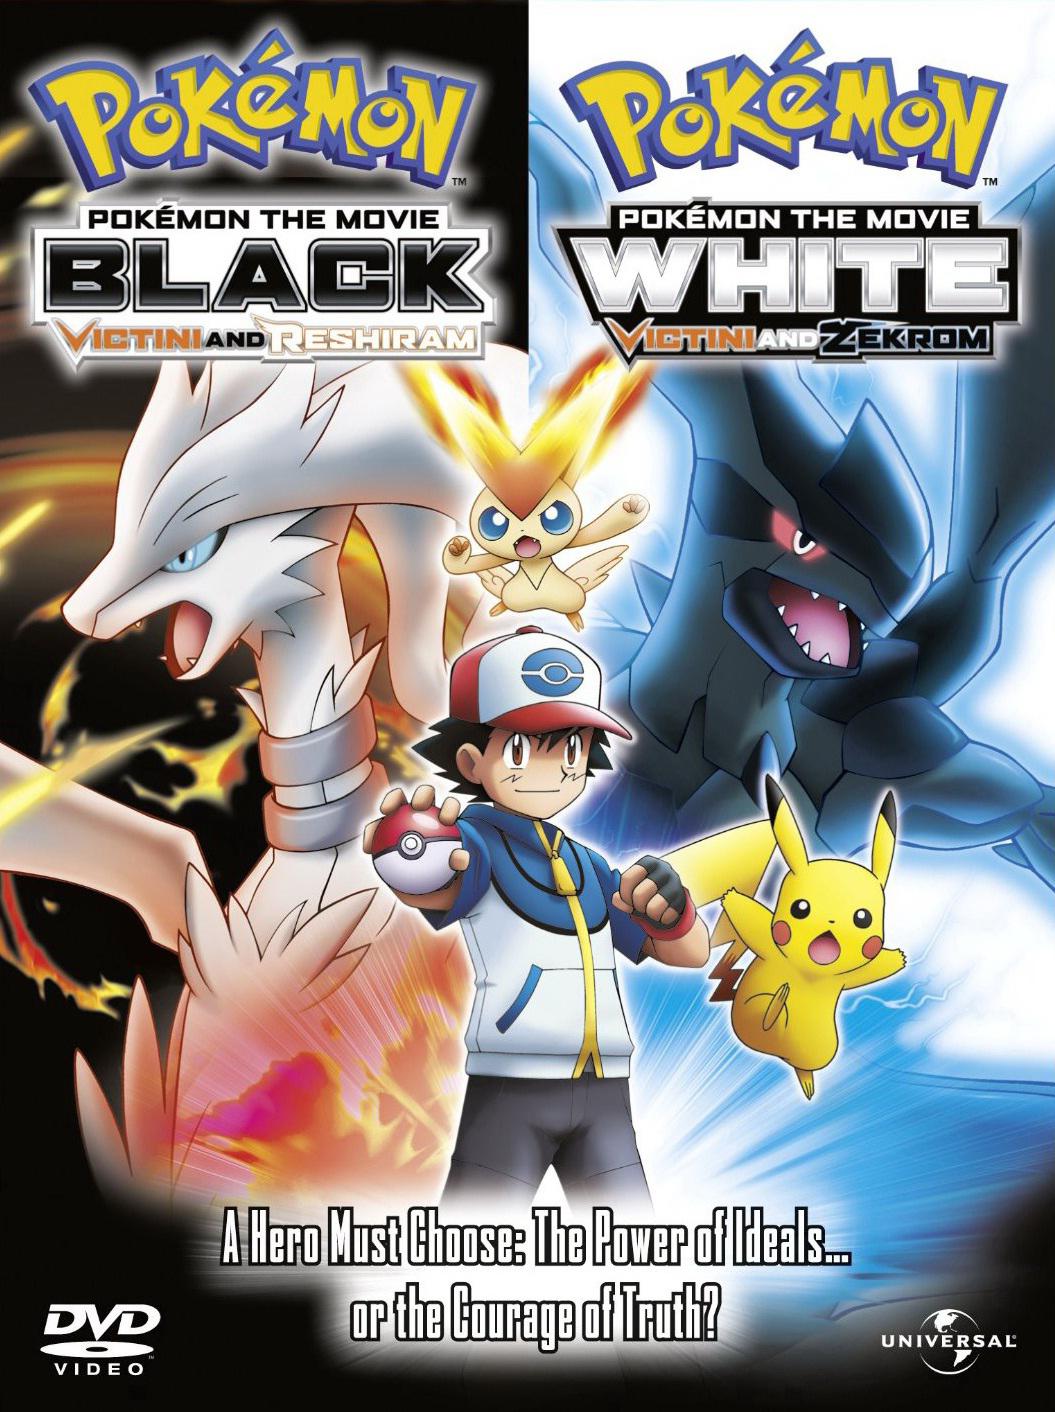 Pokemon 14 : Victini y el Heroe Blanco Reshiram